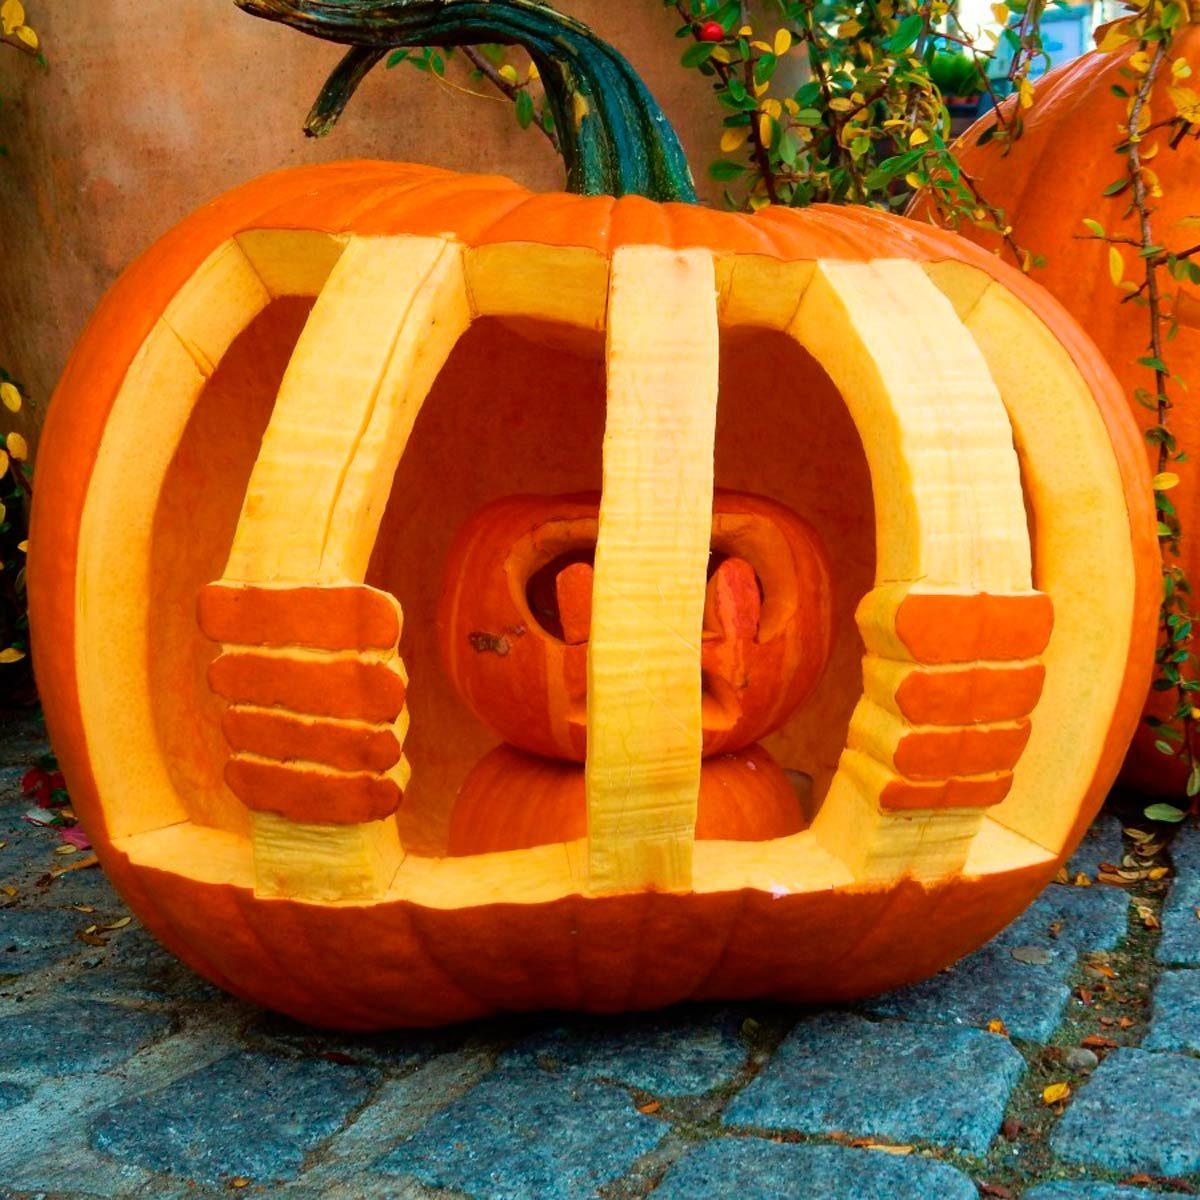 pumpkin template toilet  5 Pumpkin Carving Ideas to Inspire You this Halloween ...